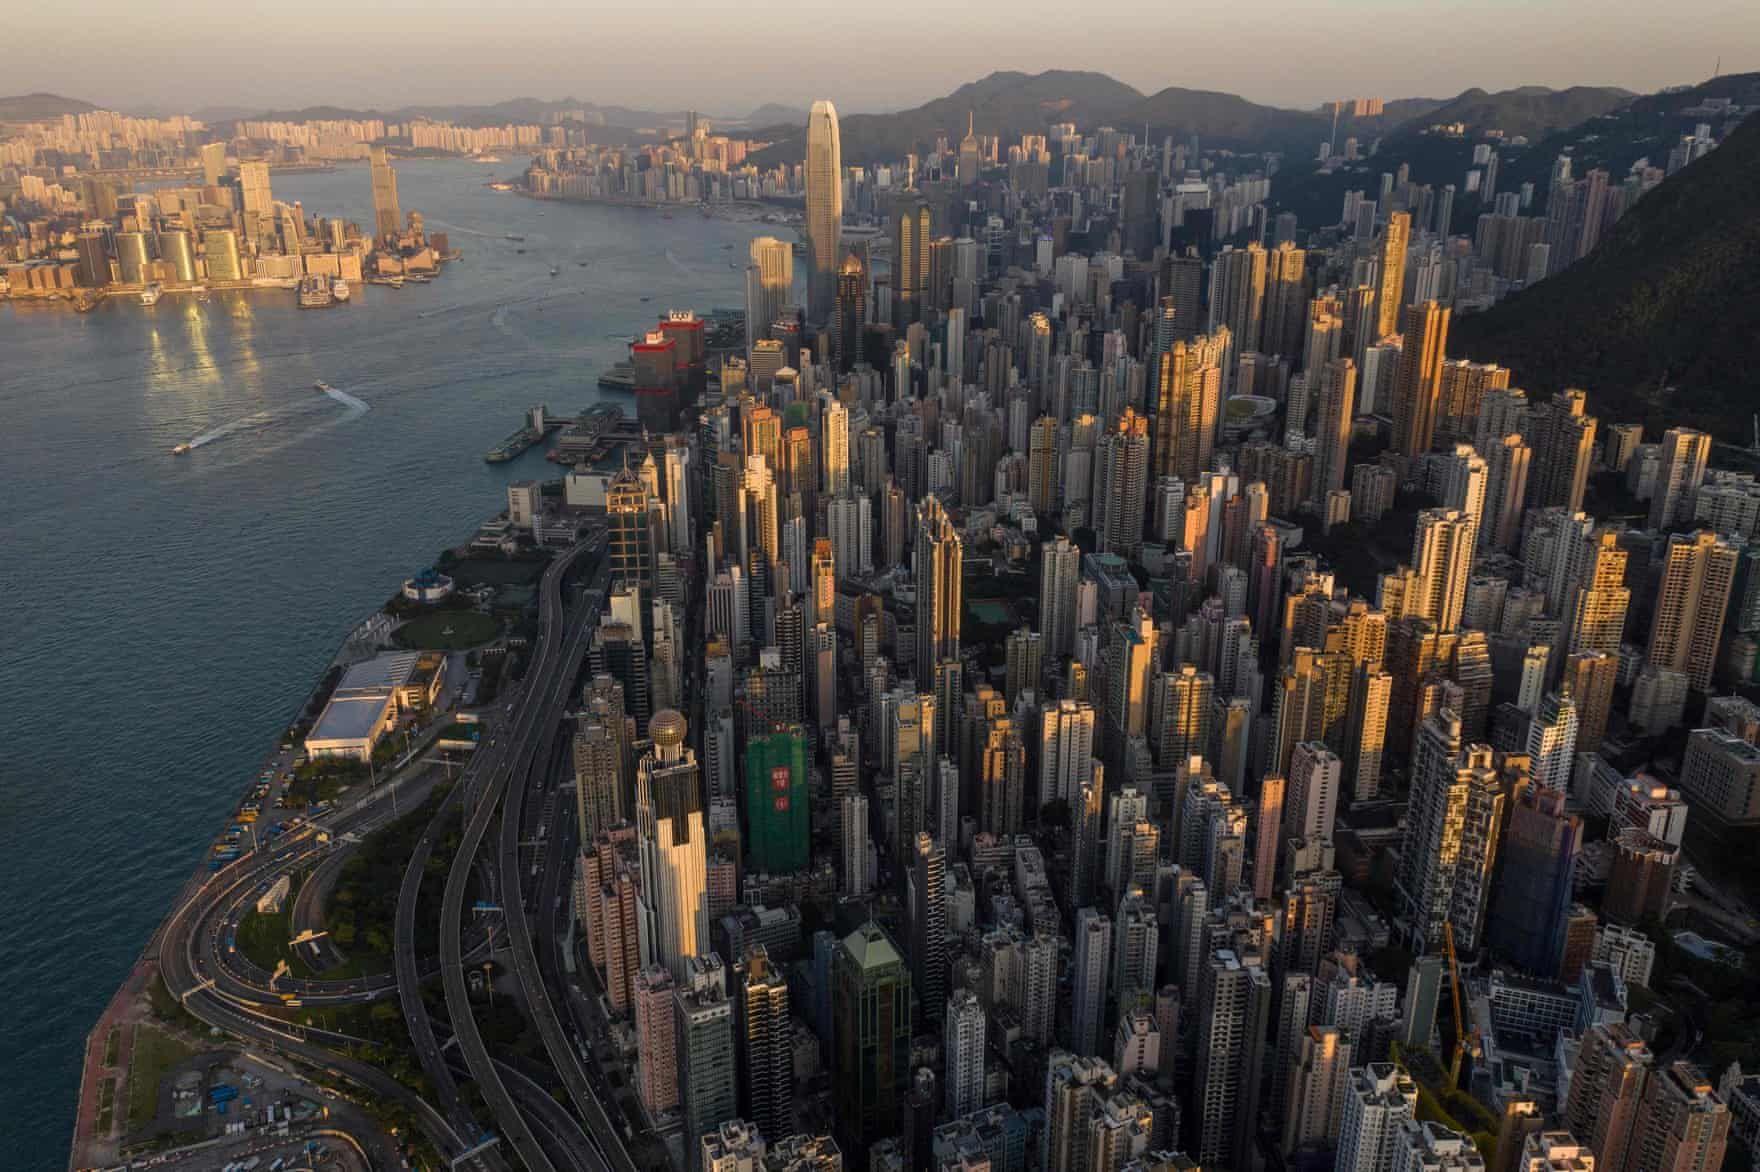 Hong Kong From The Skies In Pictures Aerial View Hong Kong Travel Hong Kong Beaches